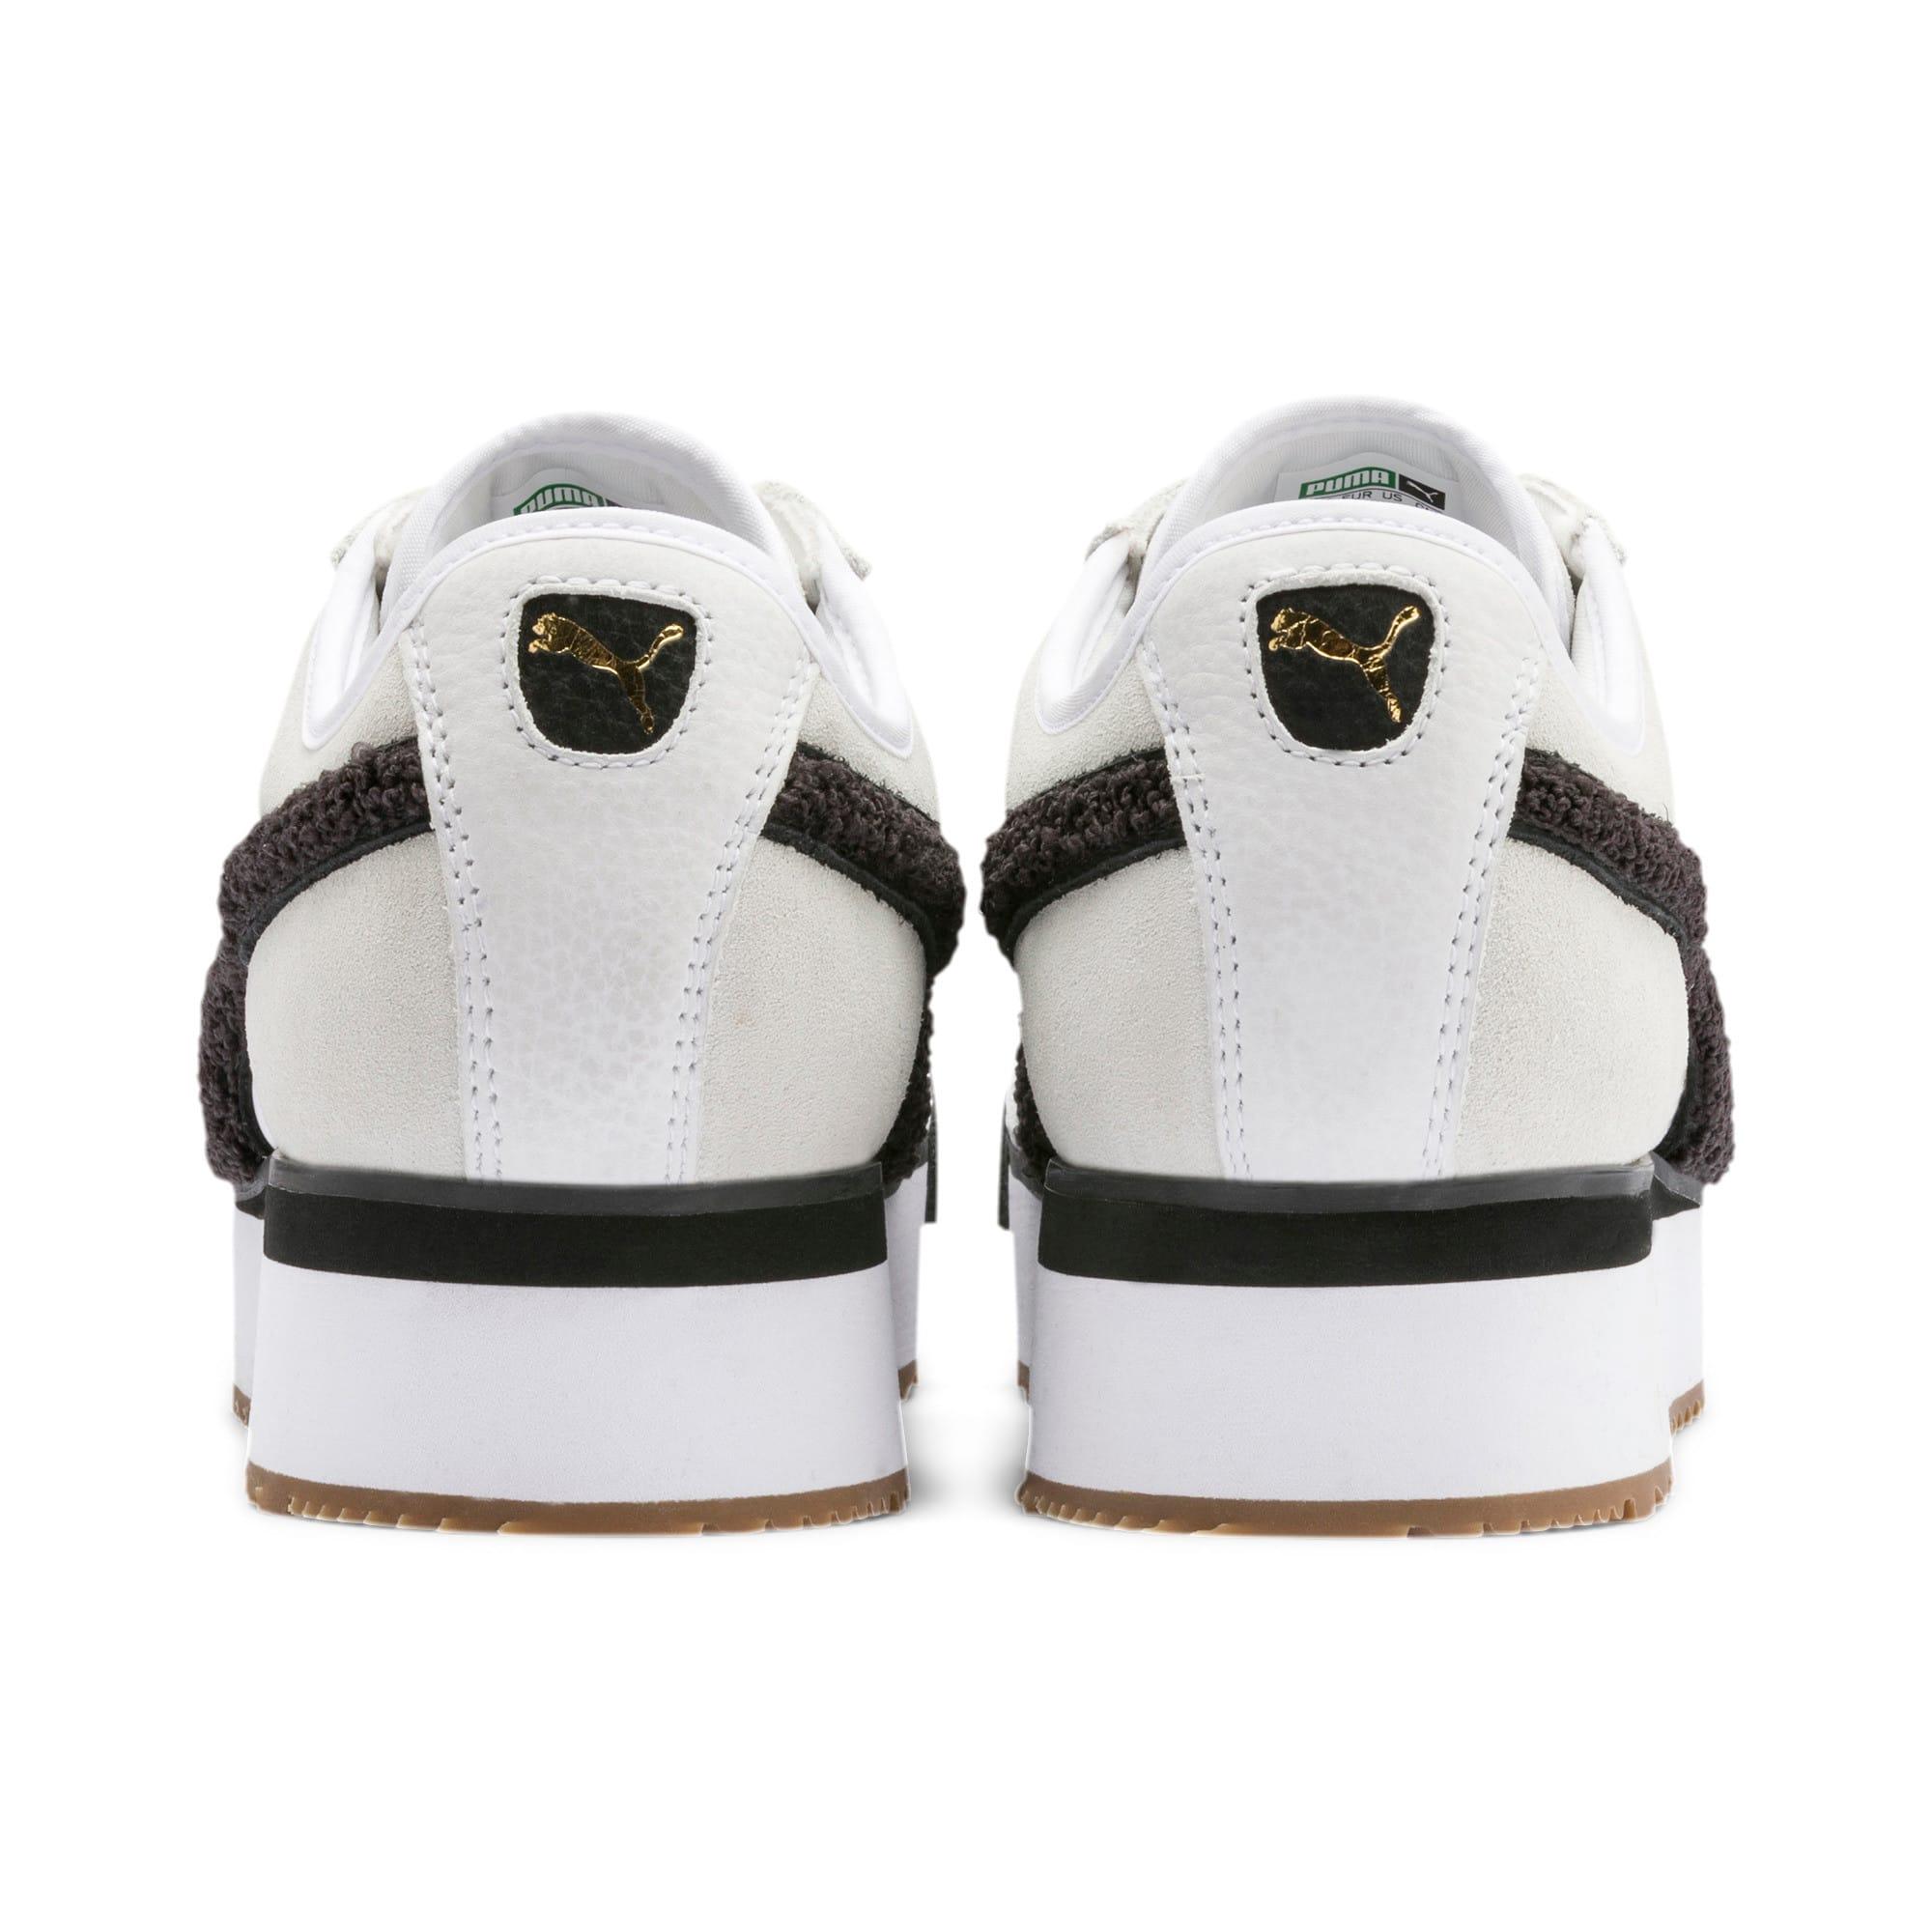 Thumbnail 4 of Roma Amor Heritage Women's Sneakers, Puma White-Puma Black, medium